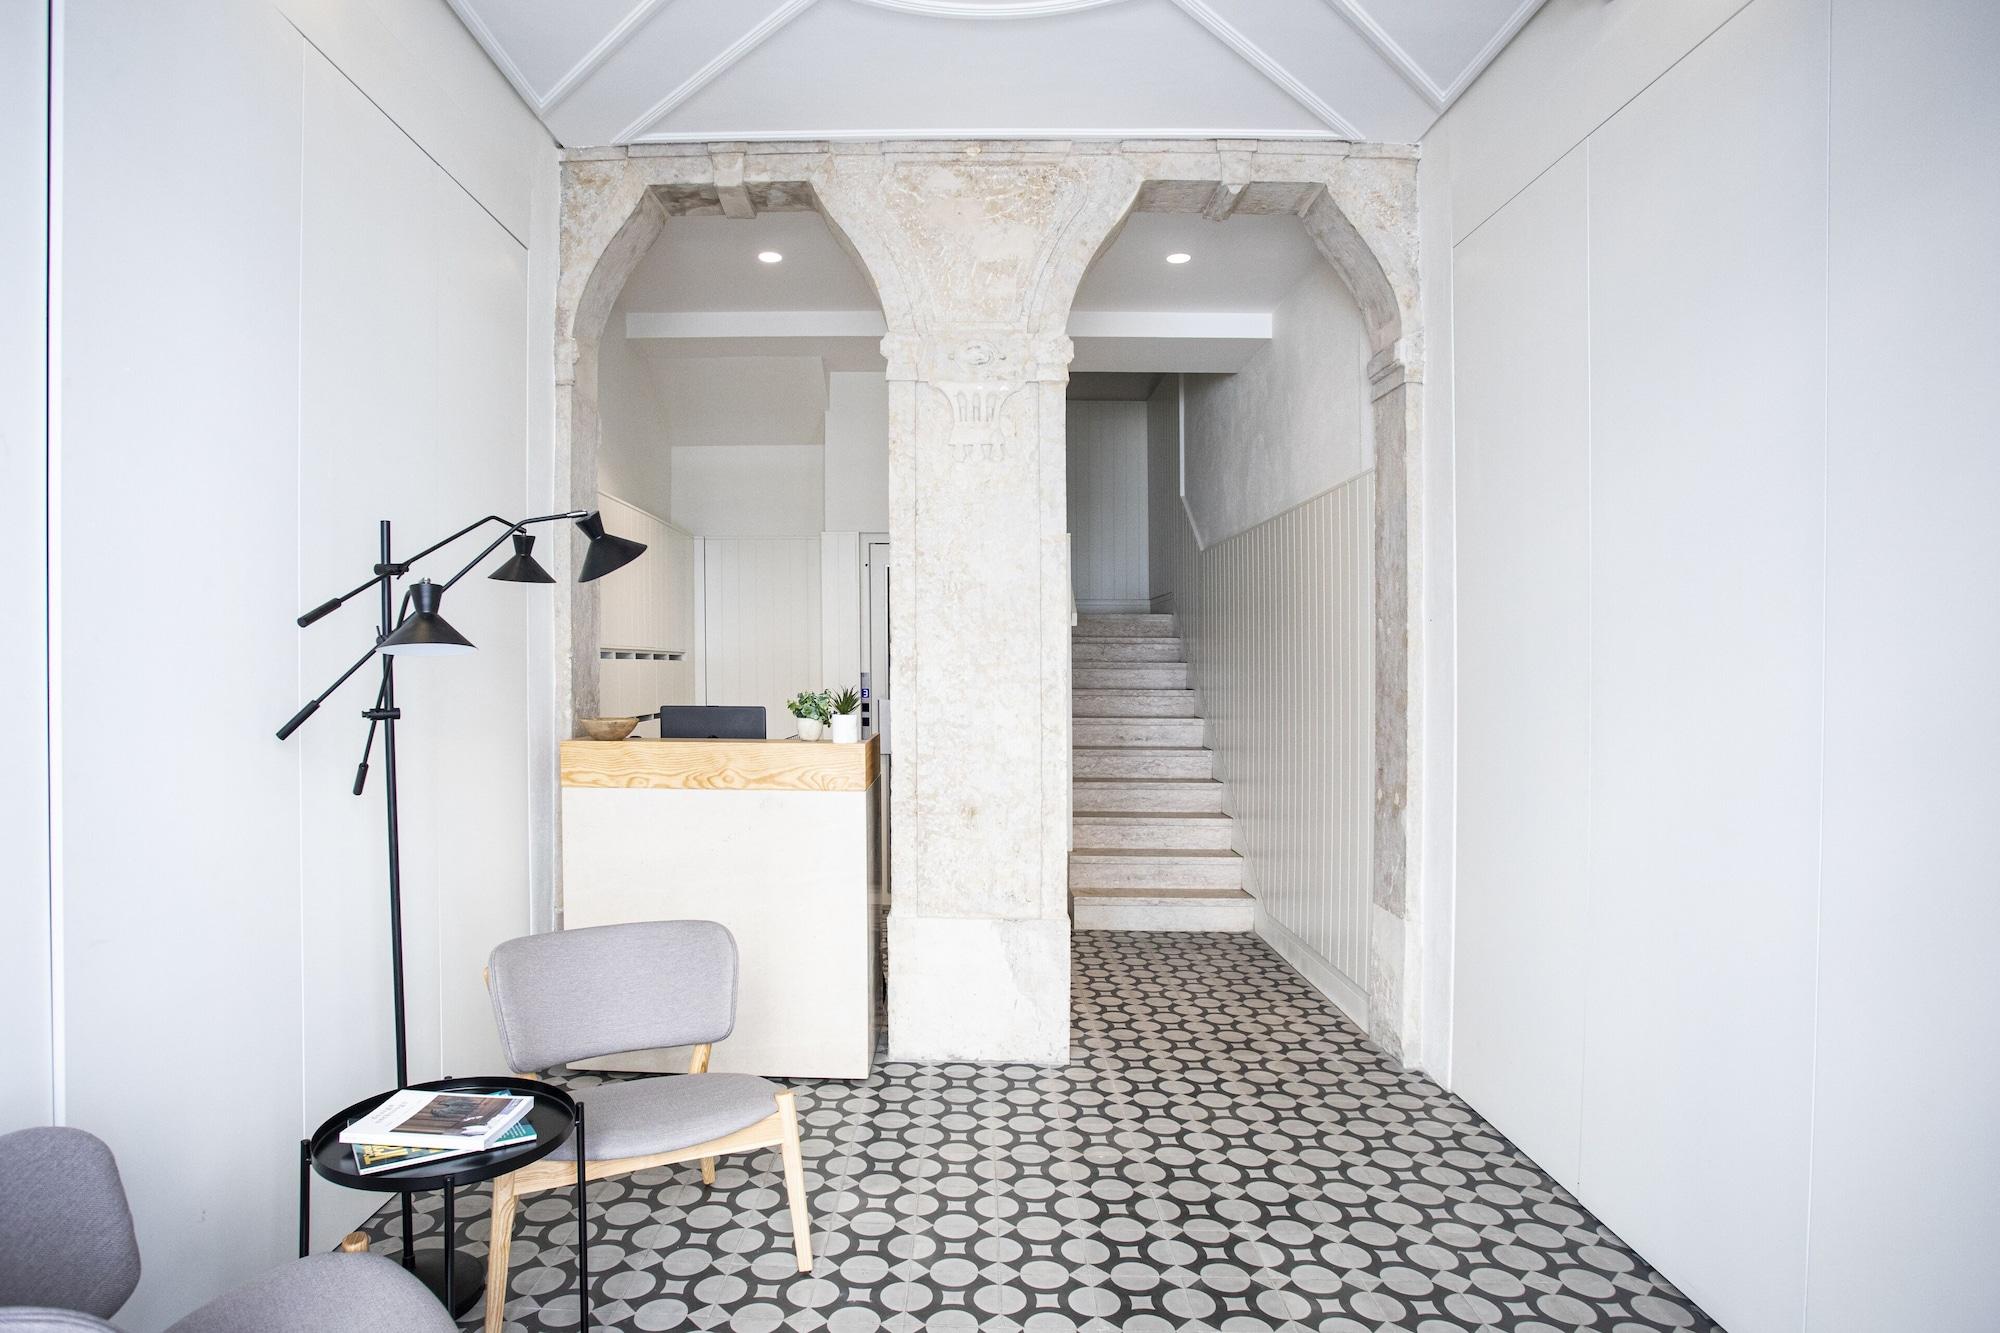 Montebelo Lx Dwt Apartments, Lisboa